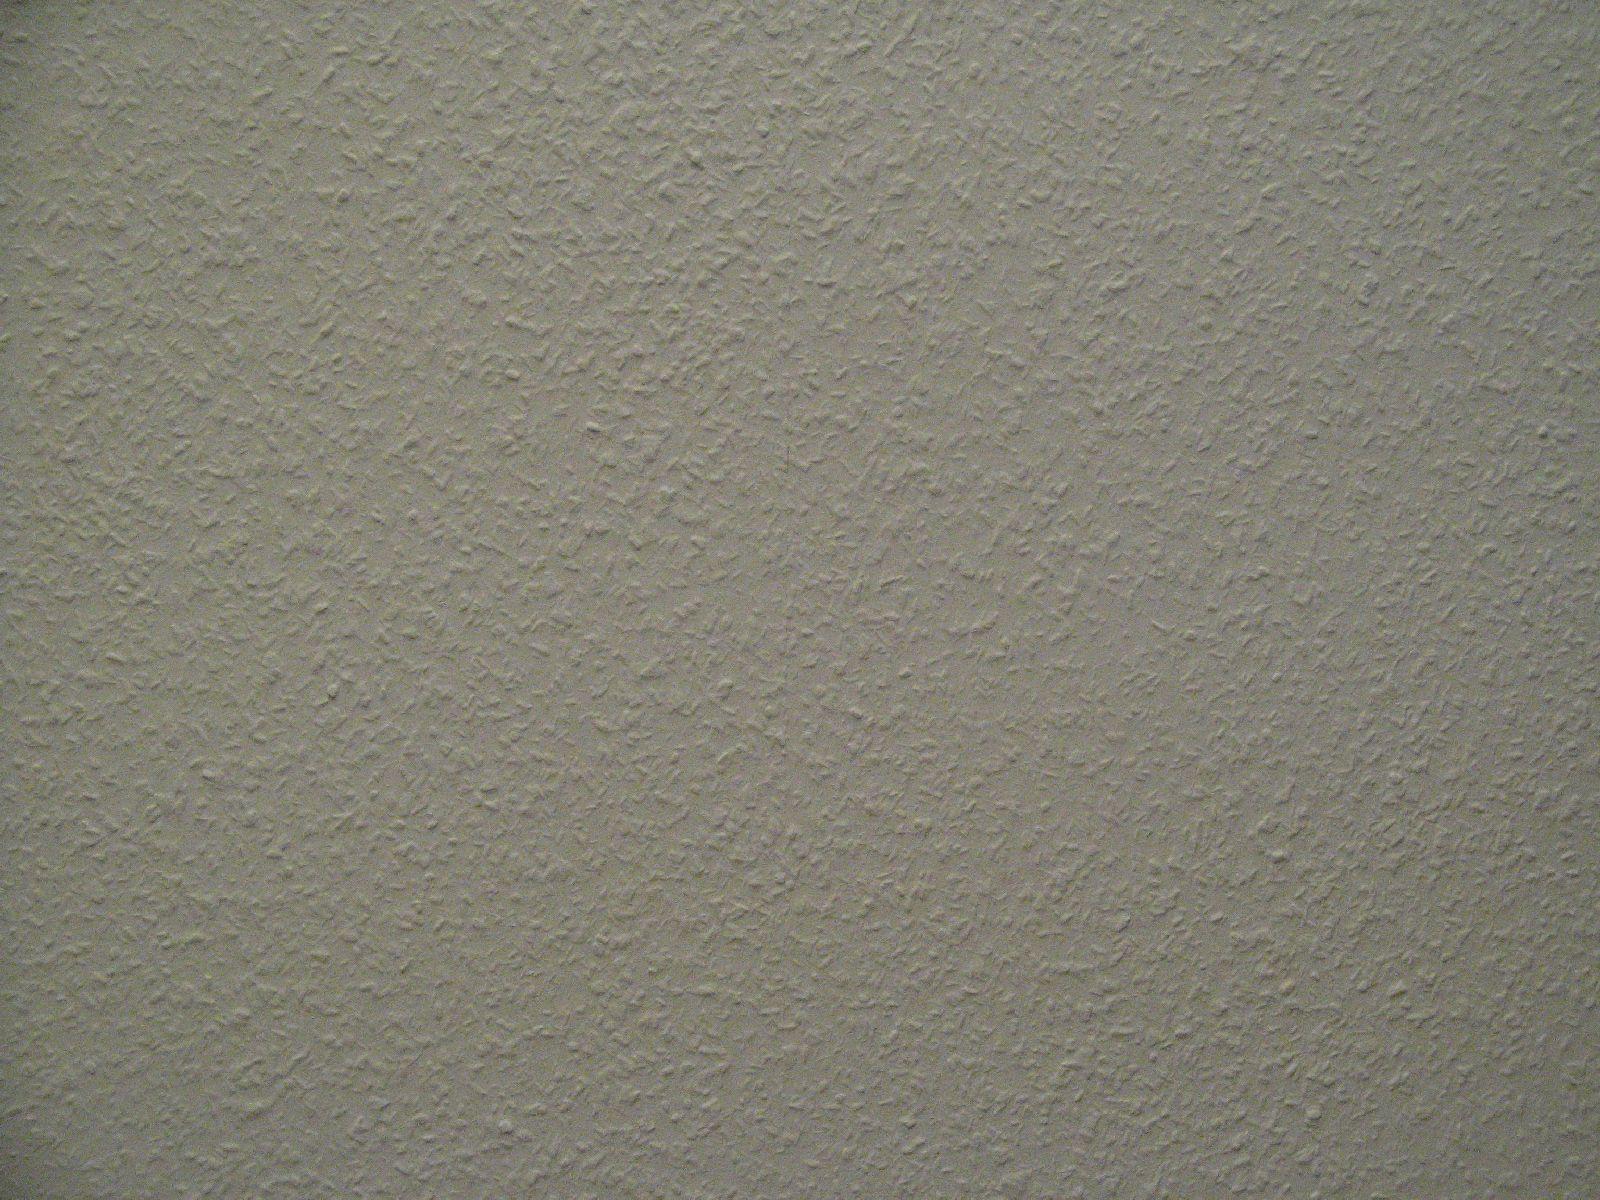 Innenraum-Material_Textur_B_4925